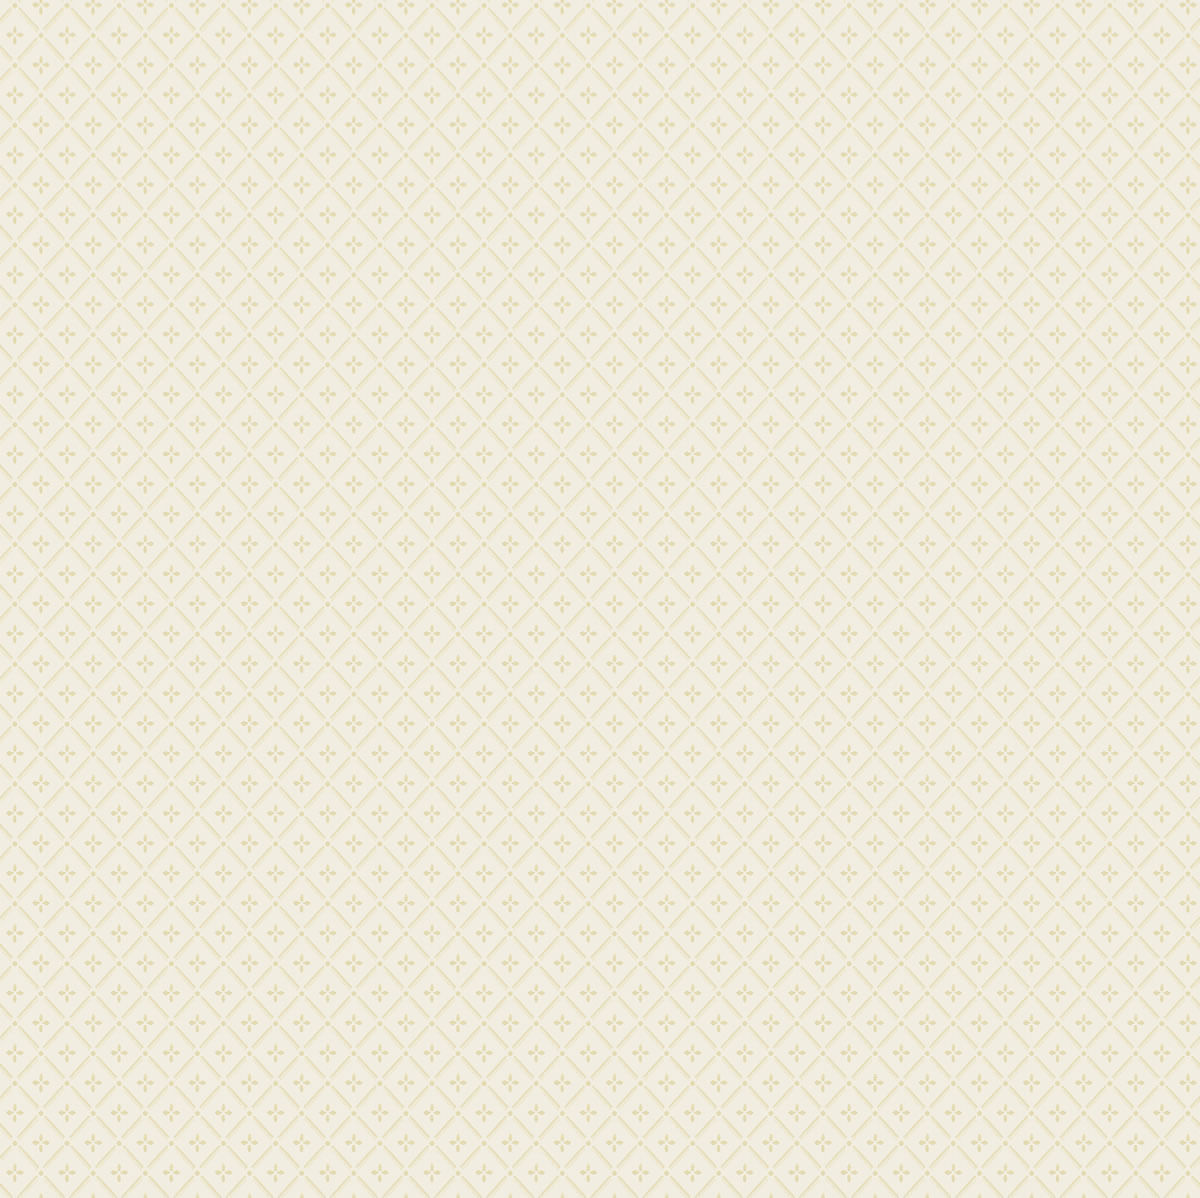 Papel de Parede Mido Mosaico 105041 - Rolo: 10m x 0,53m